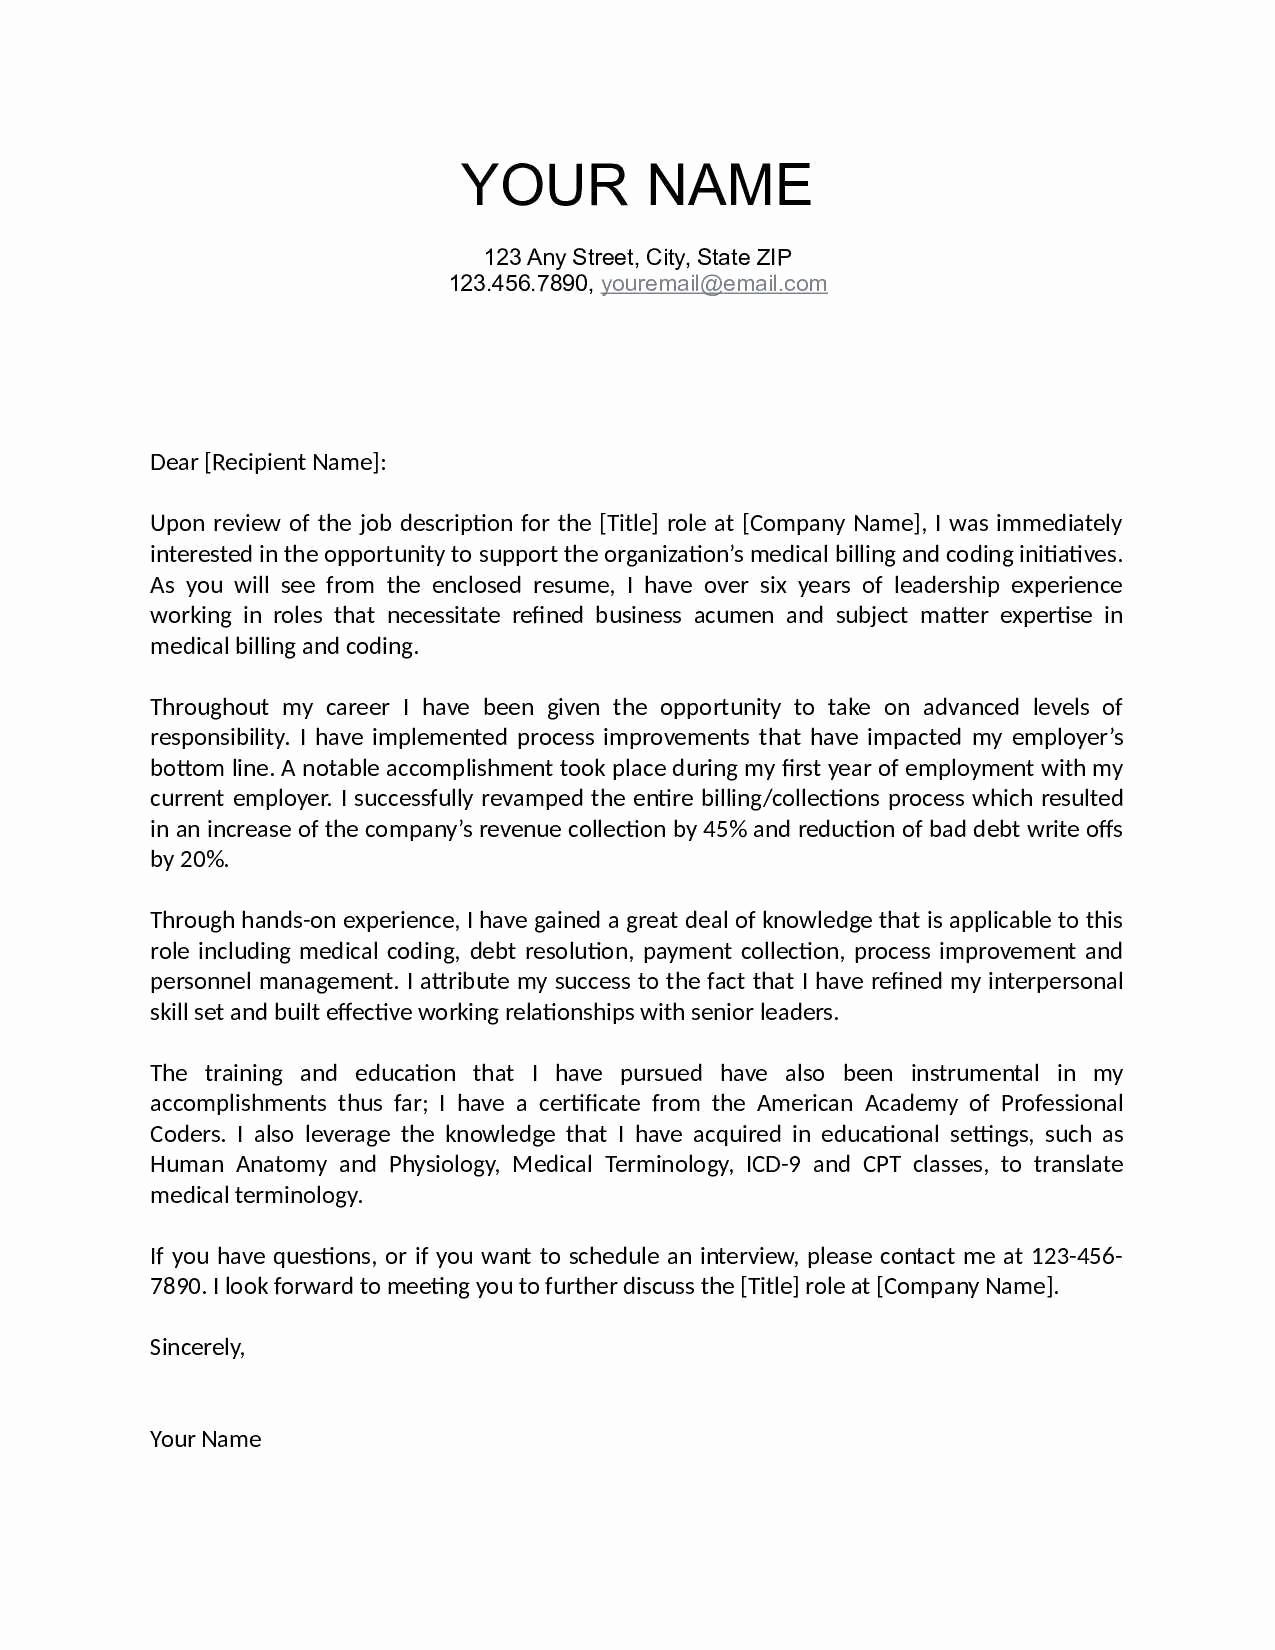 Cover Letter Template 2017 - Fax Cover Letters Unique formal Job Fer Letter Valid Job Fer Letter